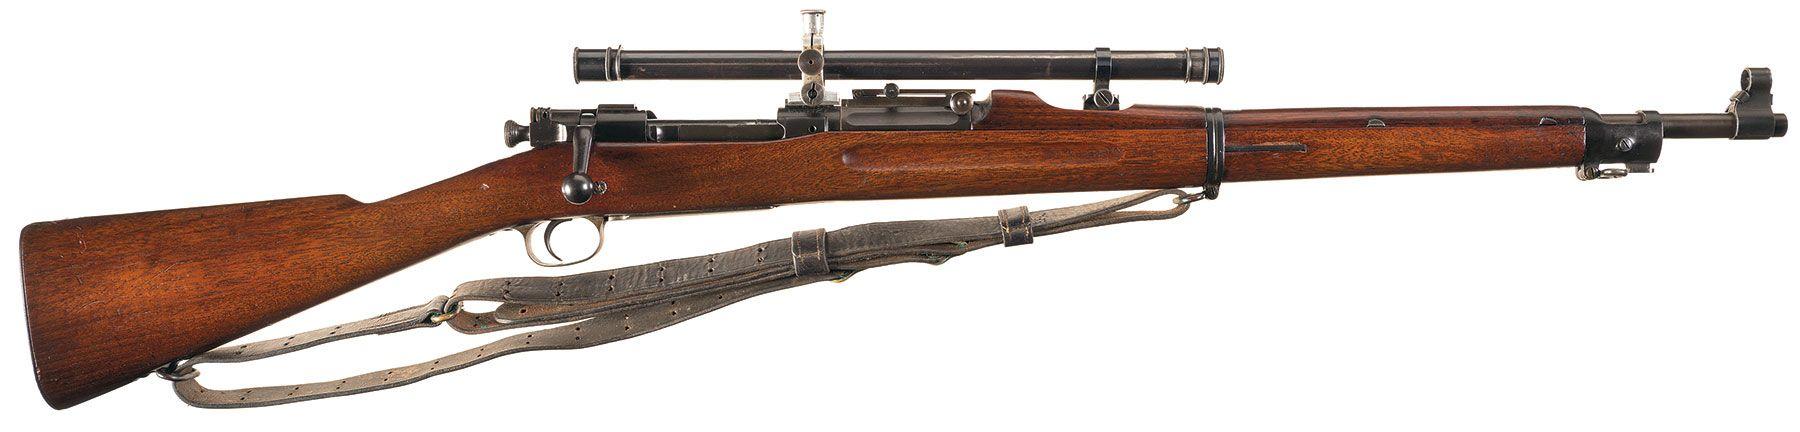 Springfield Armory M 1903 Sniper Rifle